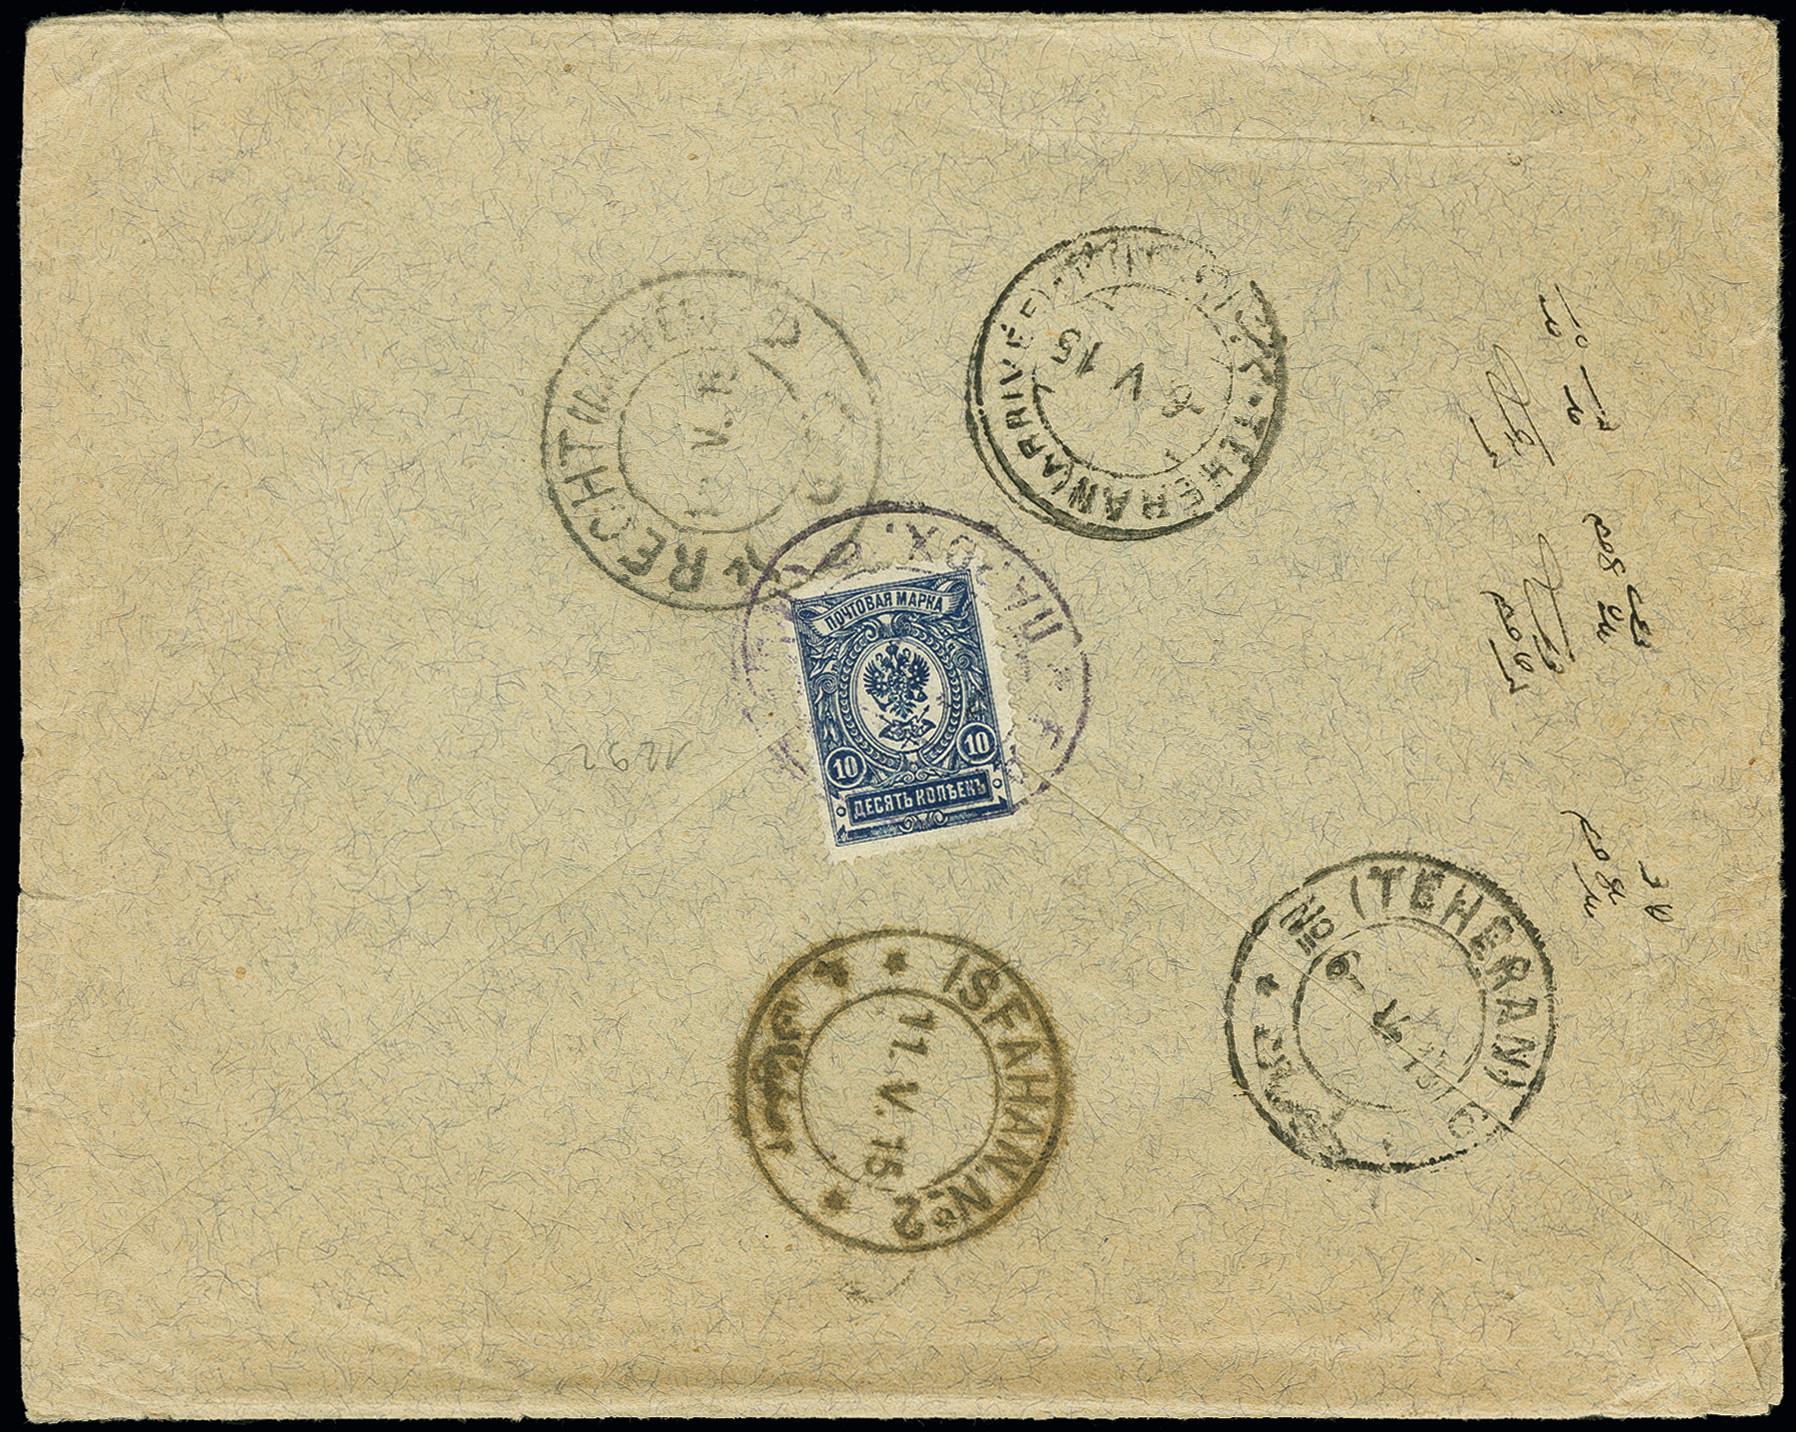 Lot 1147 - Main catalogue foreign ship mail -  Heinrich Koehler Auktionen Auction #368- Day 2